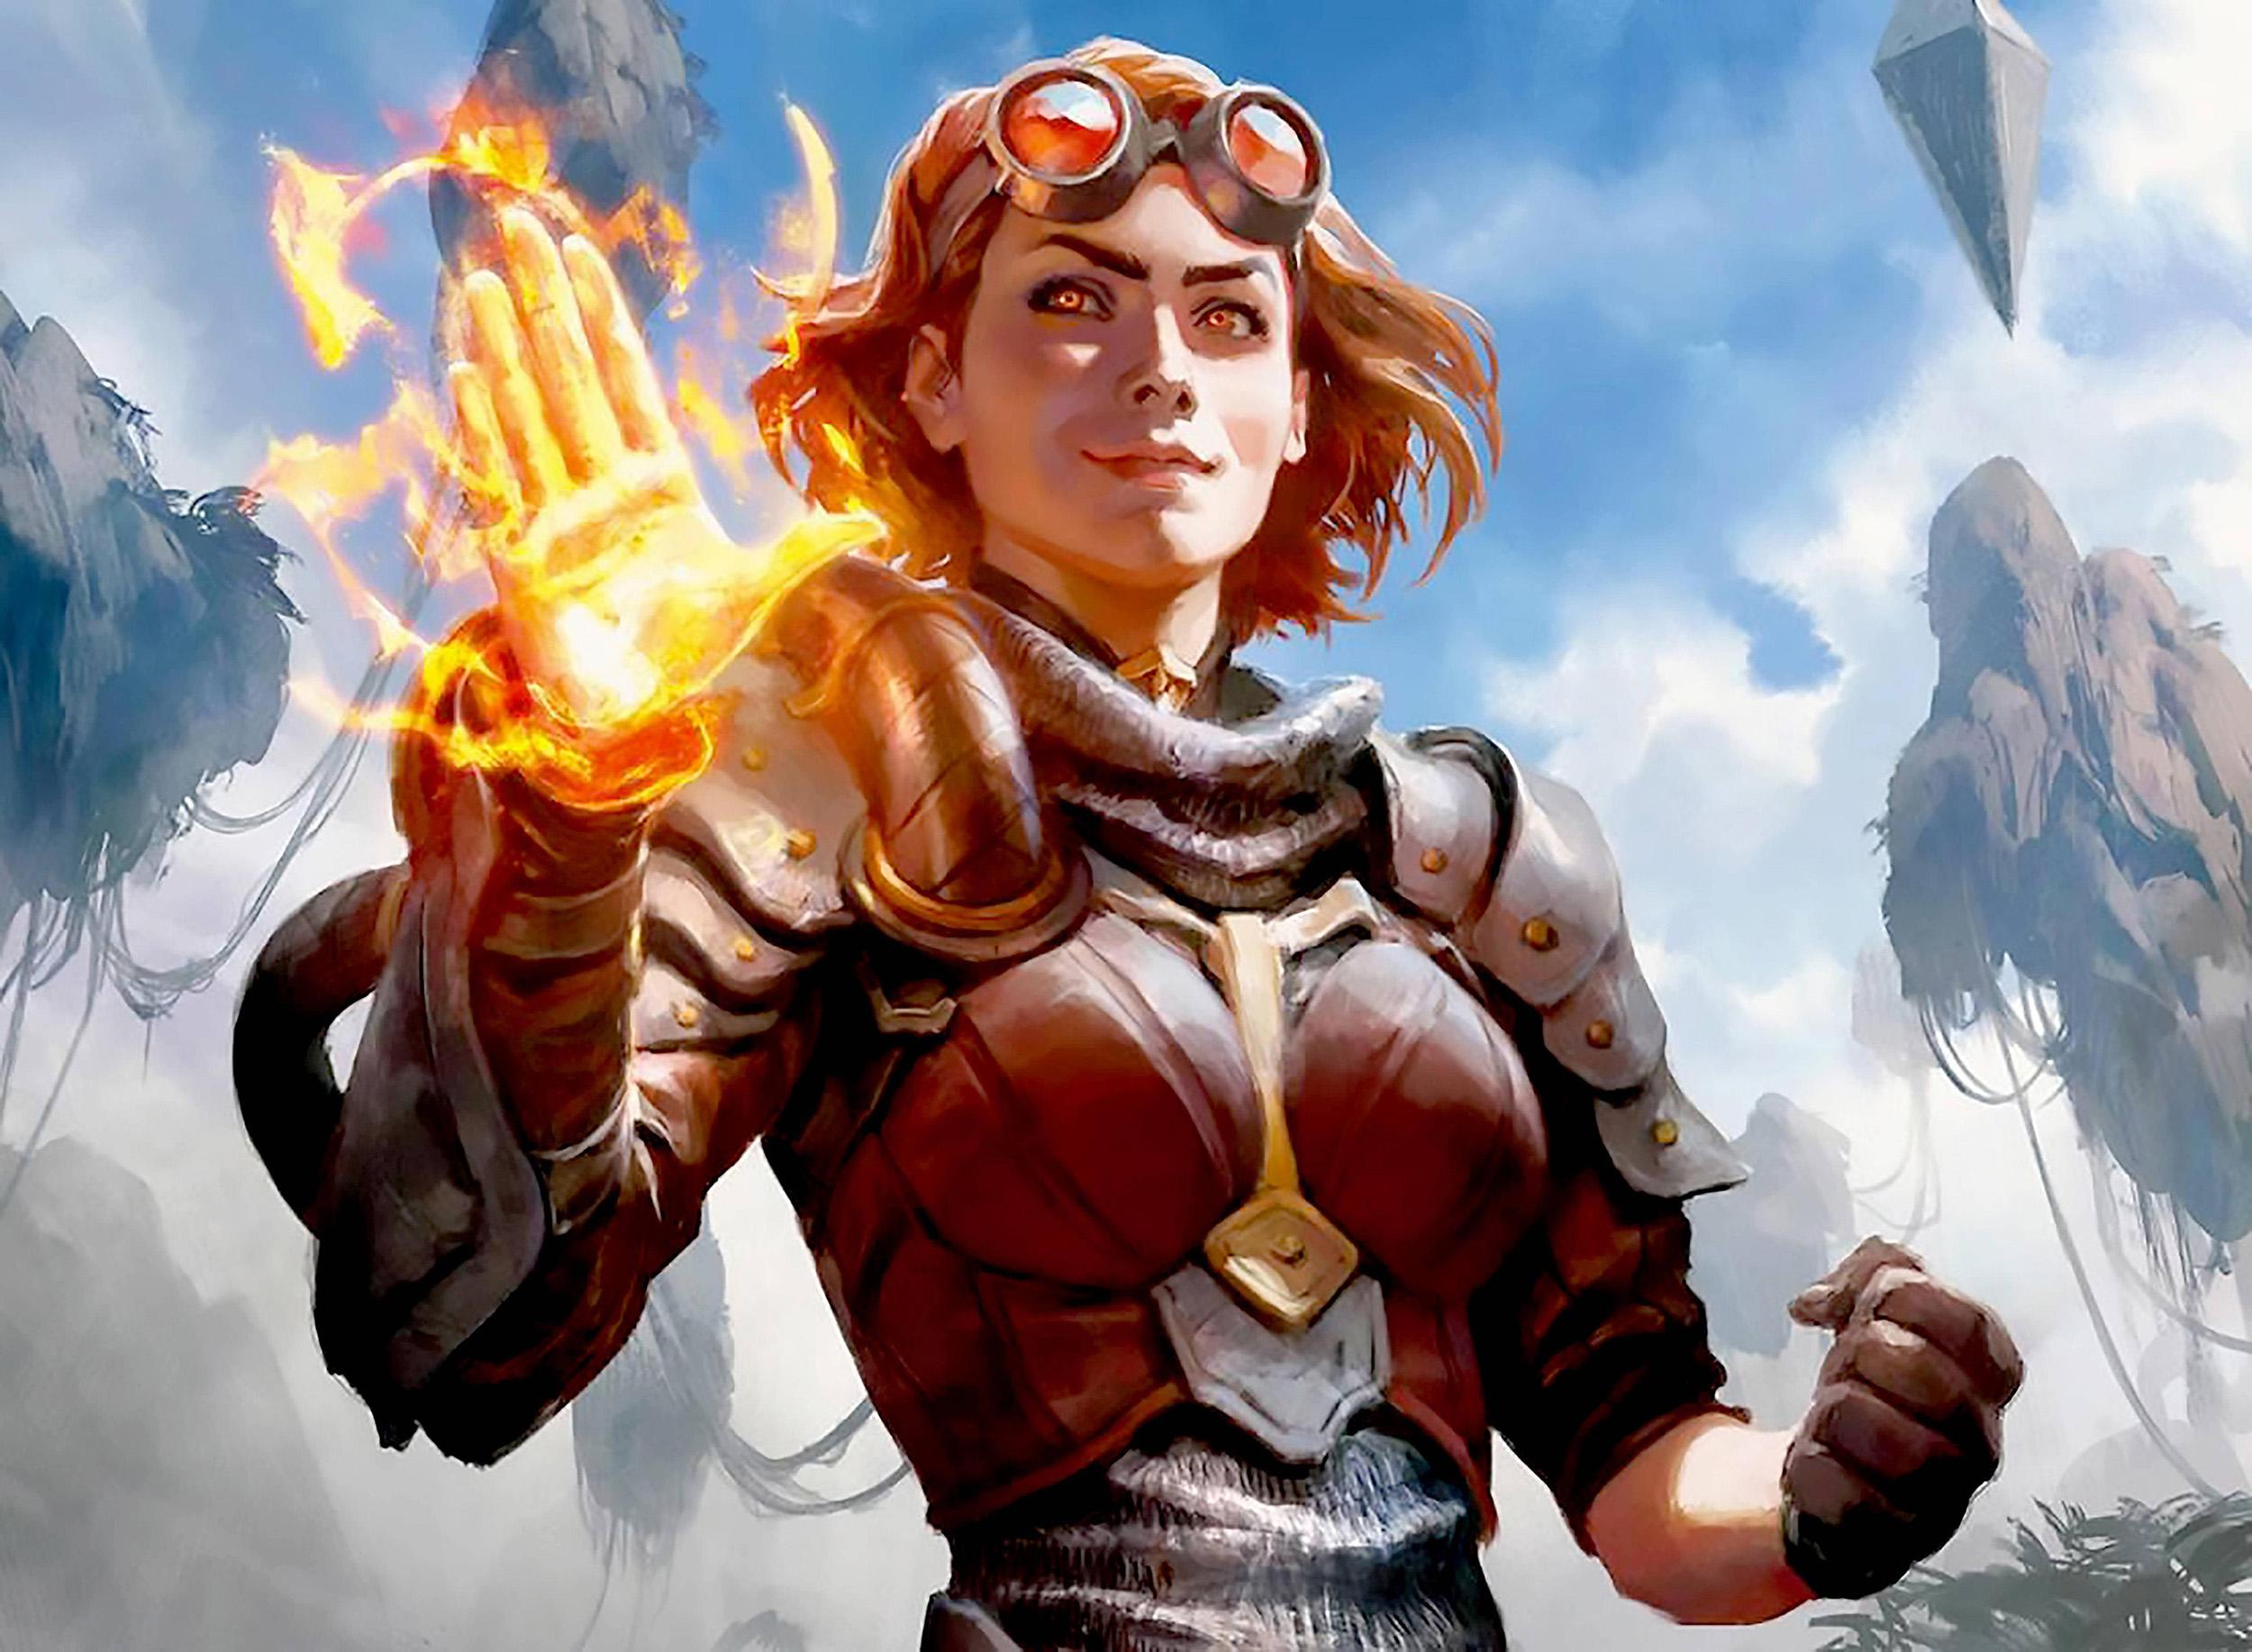 Oath of Chandra | Illustration by Wesley Burt